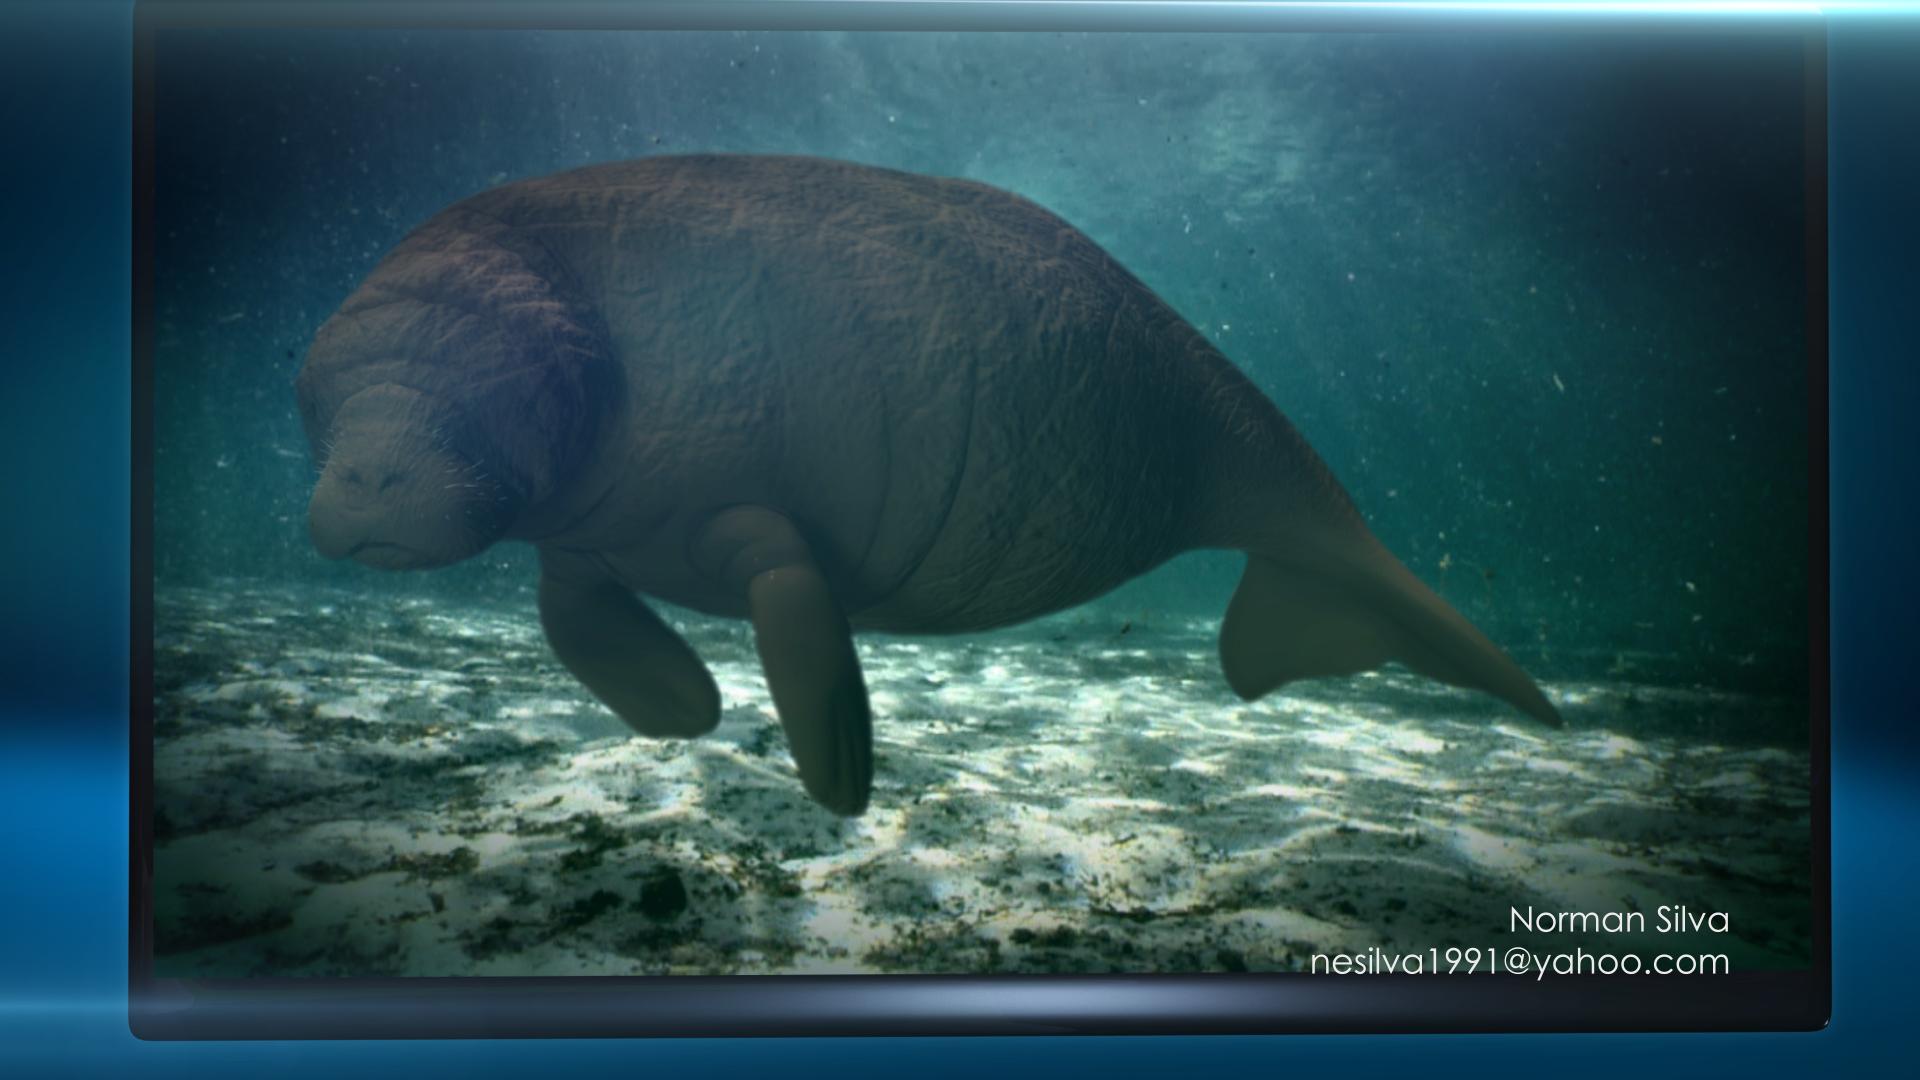 Visualizations-Norman Silva- Steller Sea Cow.png